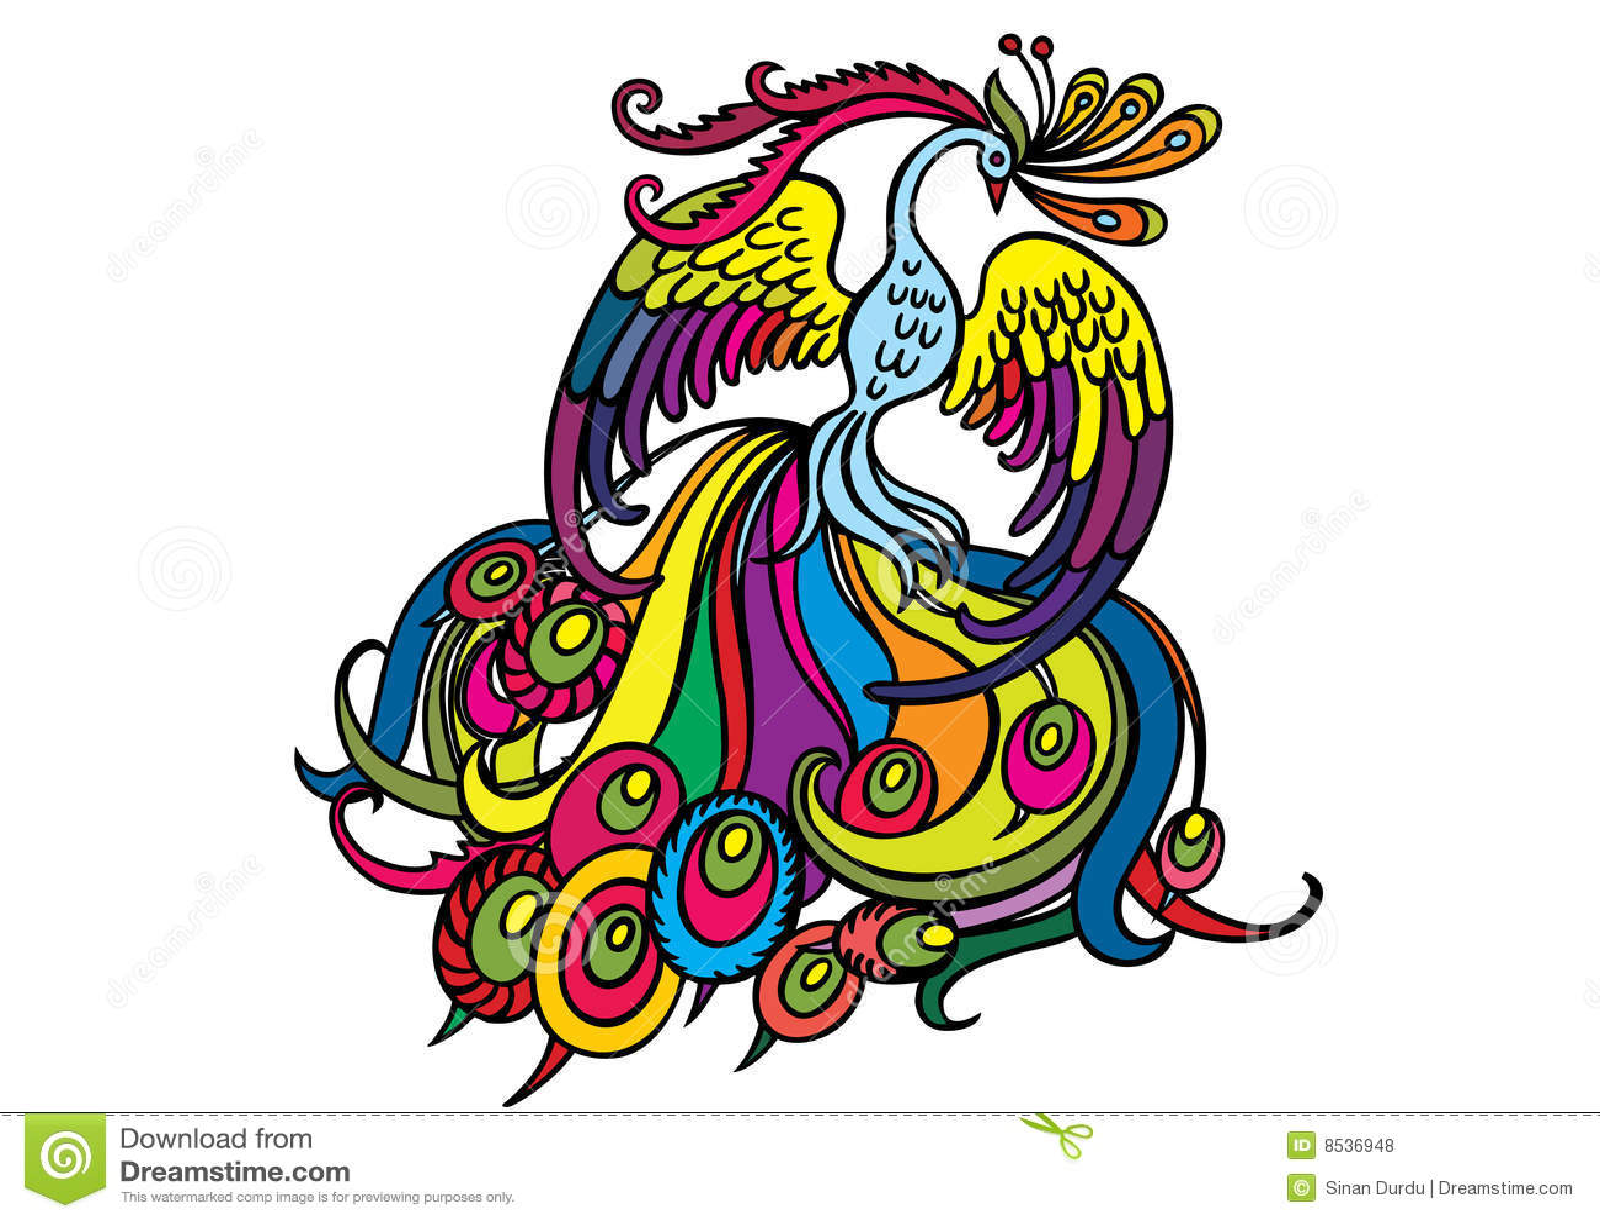 Multi Colored Phoenix Royalty Free Stock Photos Image